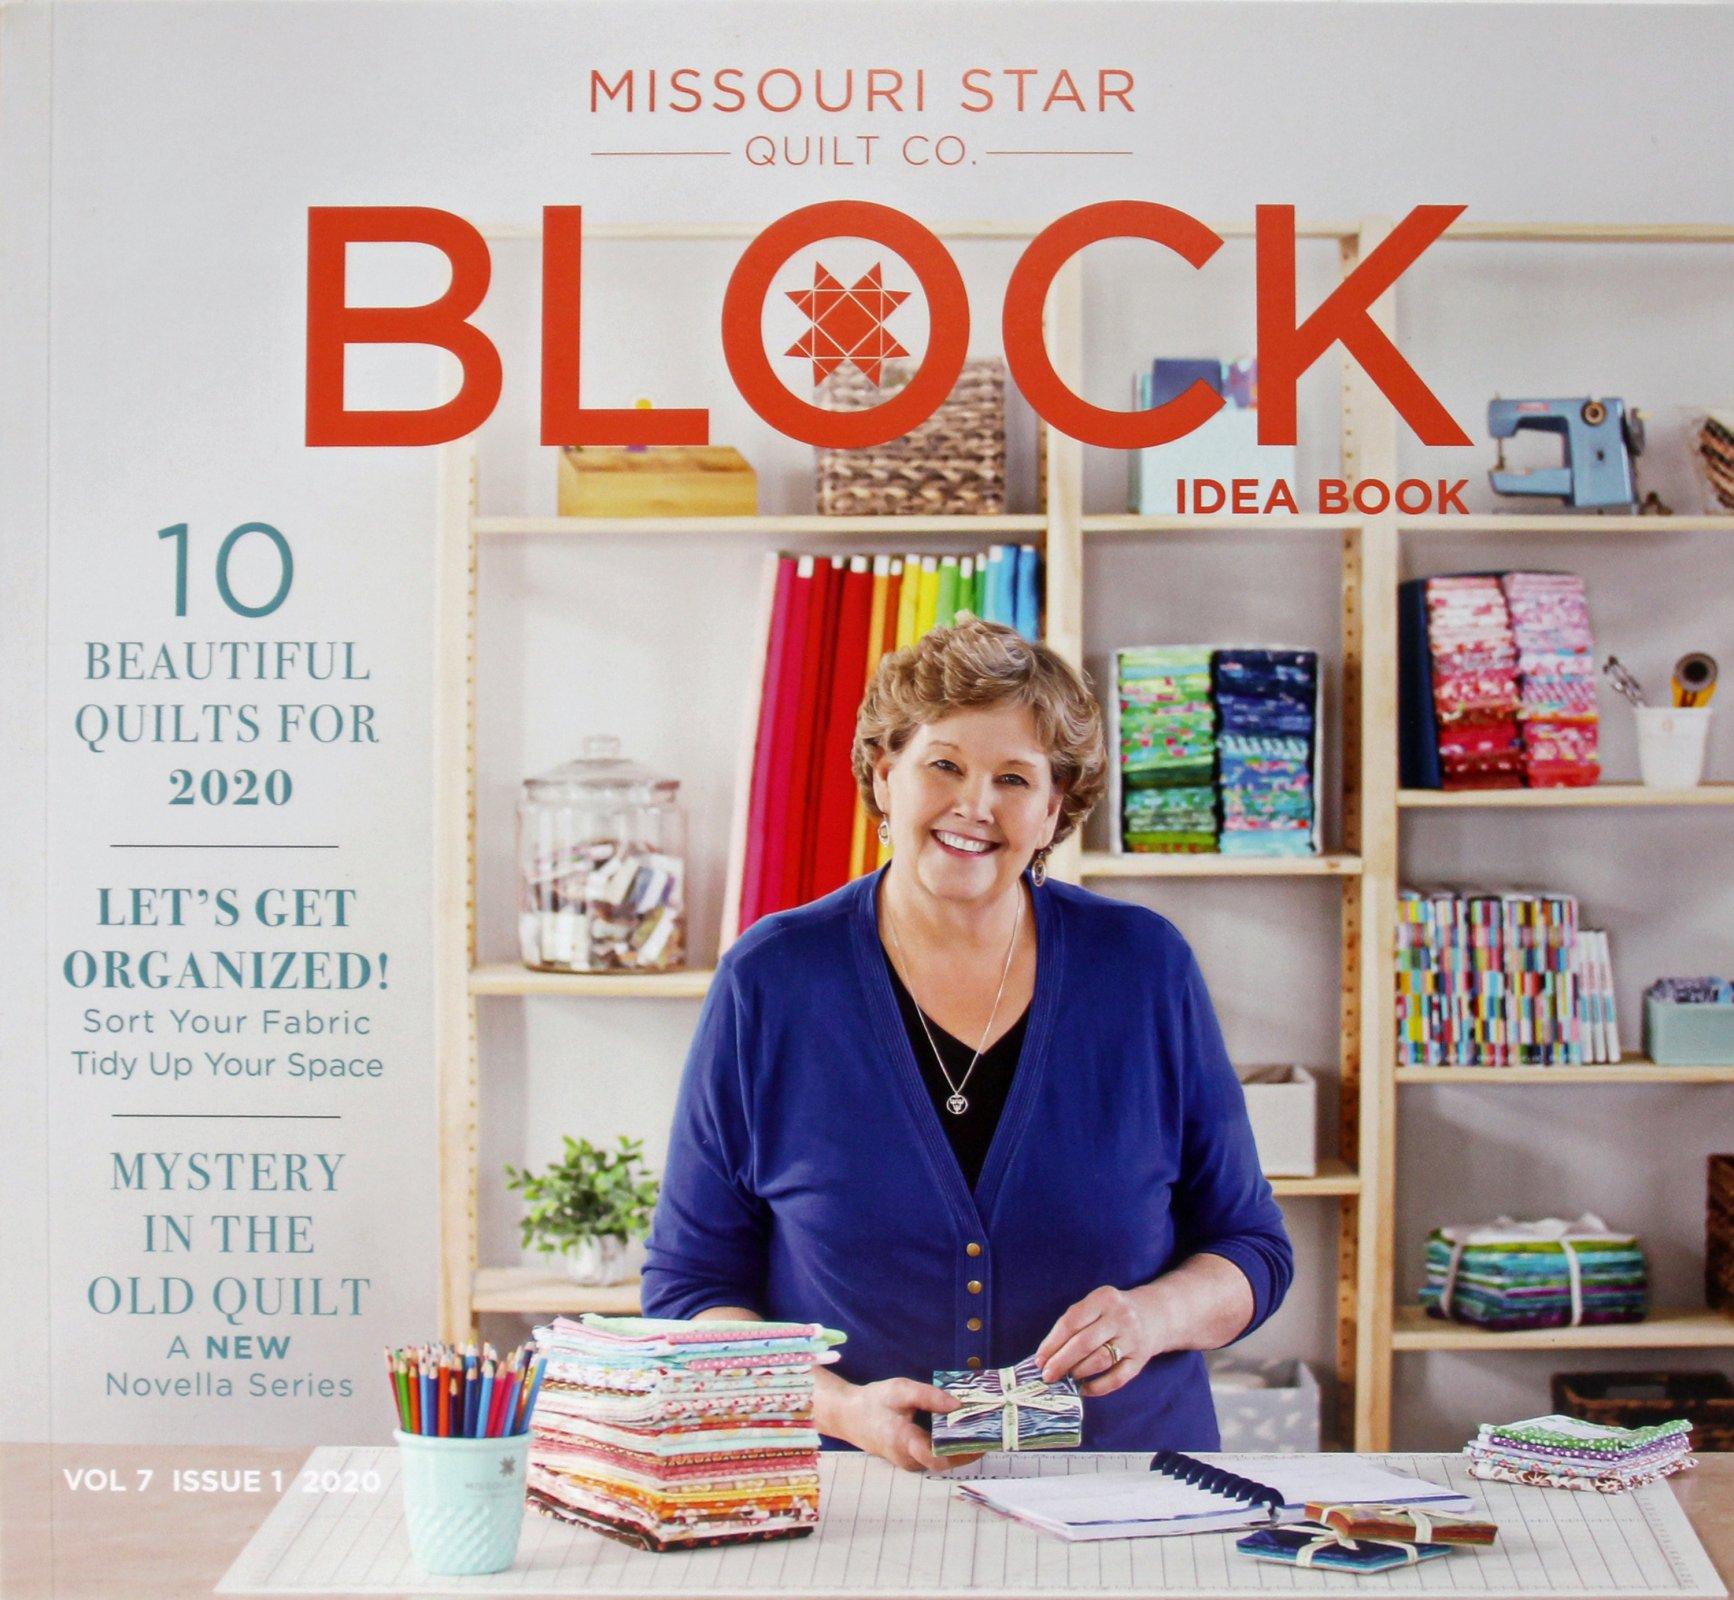 Block Idea Book, vol. 7, issue 1 2020